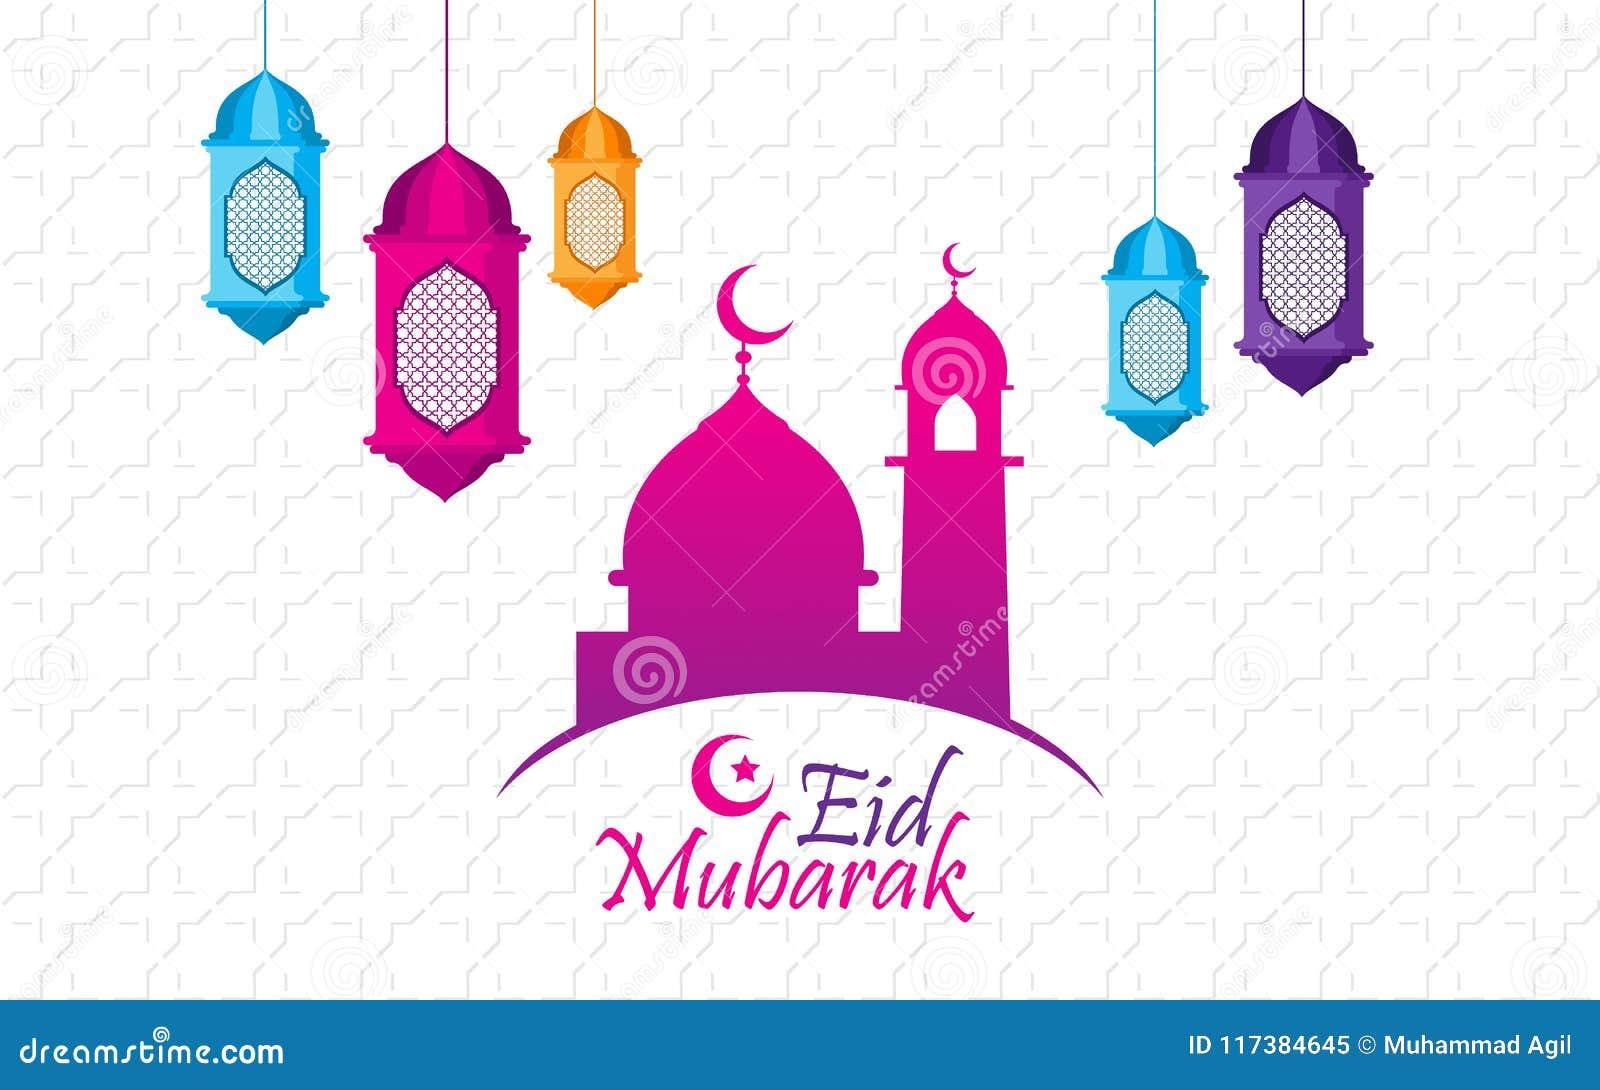 Happy Eid al fitr with lantern and ornament